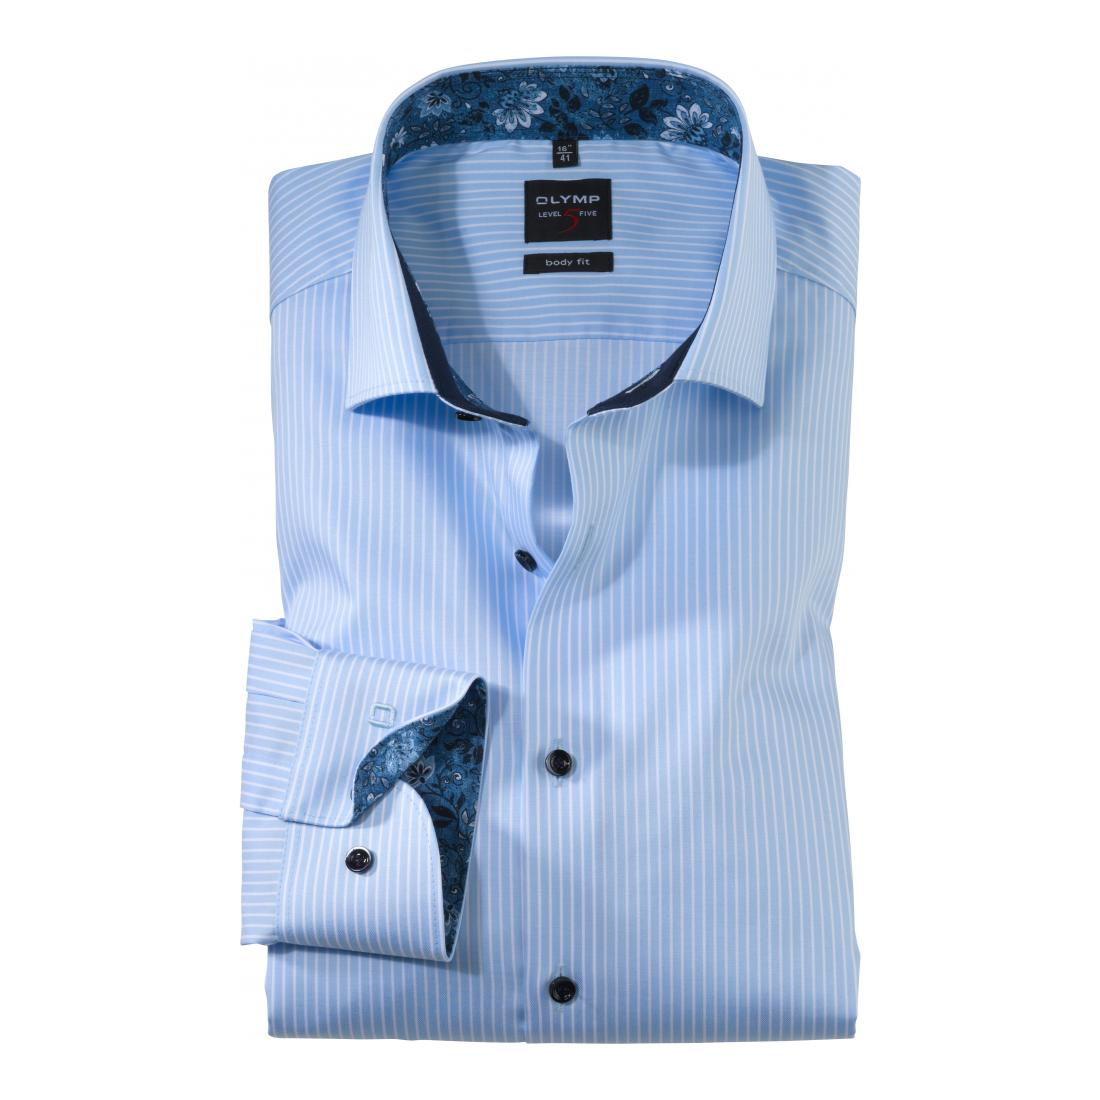 Olymp Business Hemden Herren 2164/74 Hemden